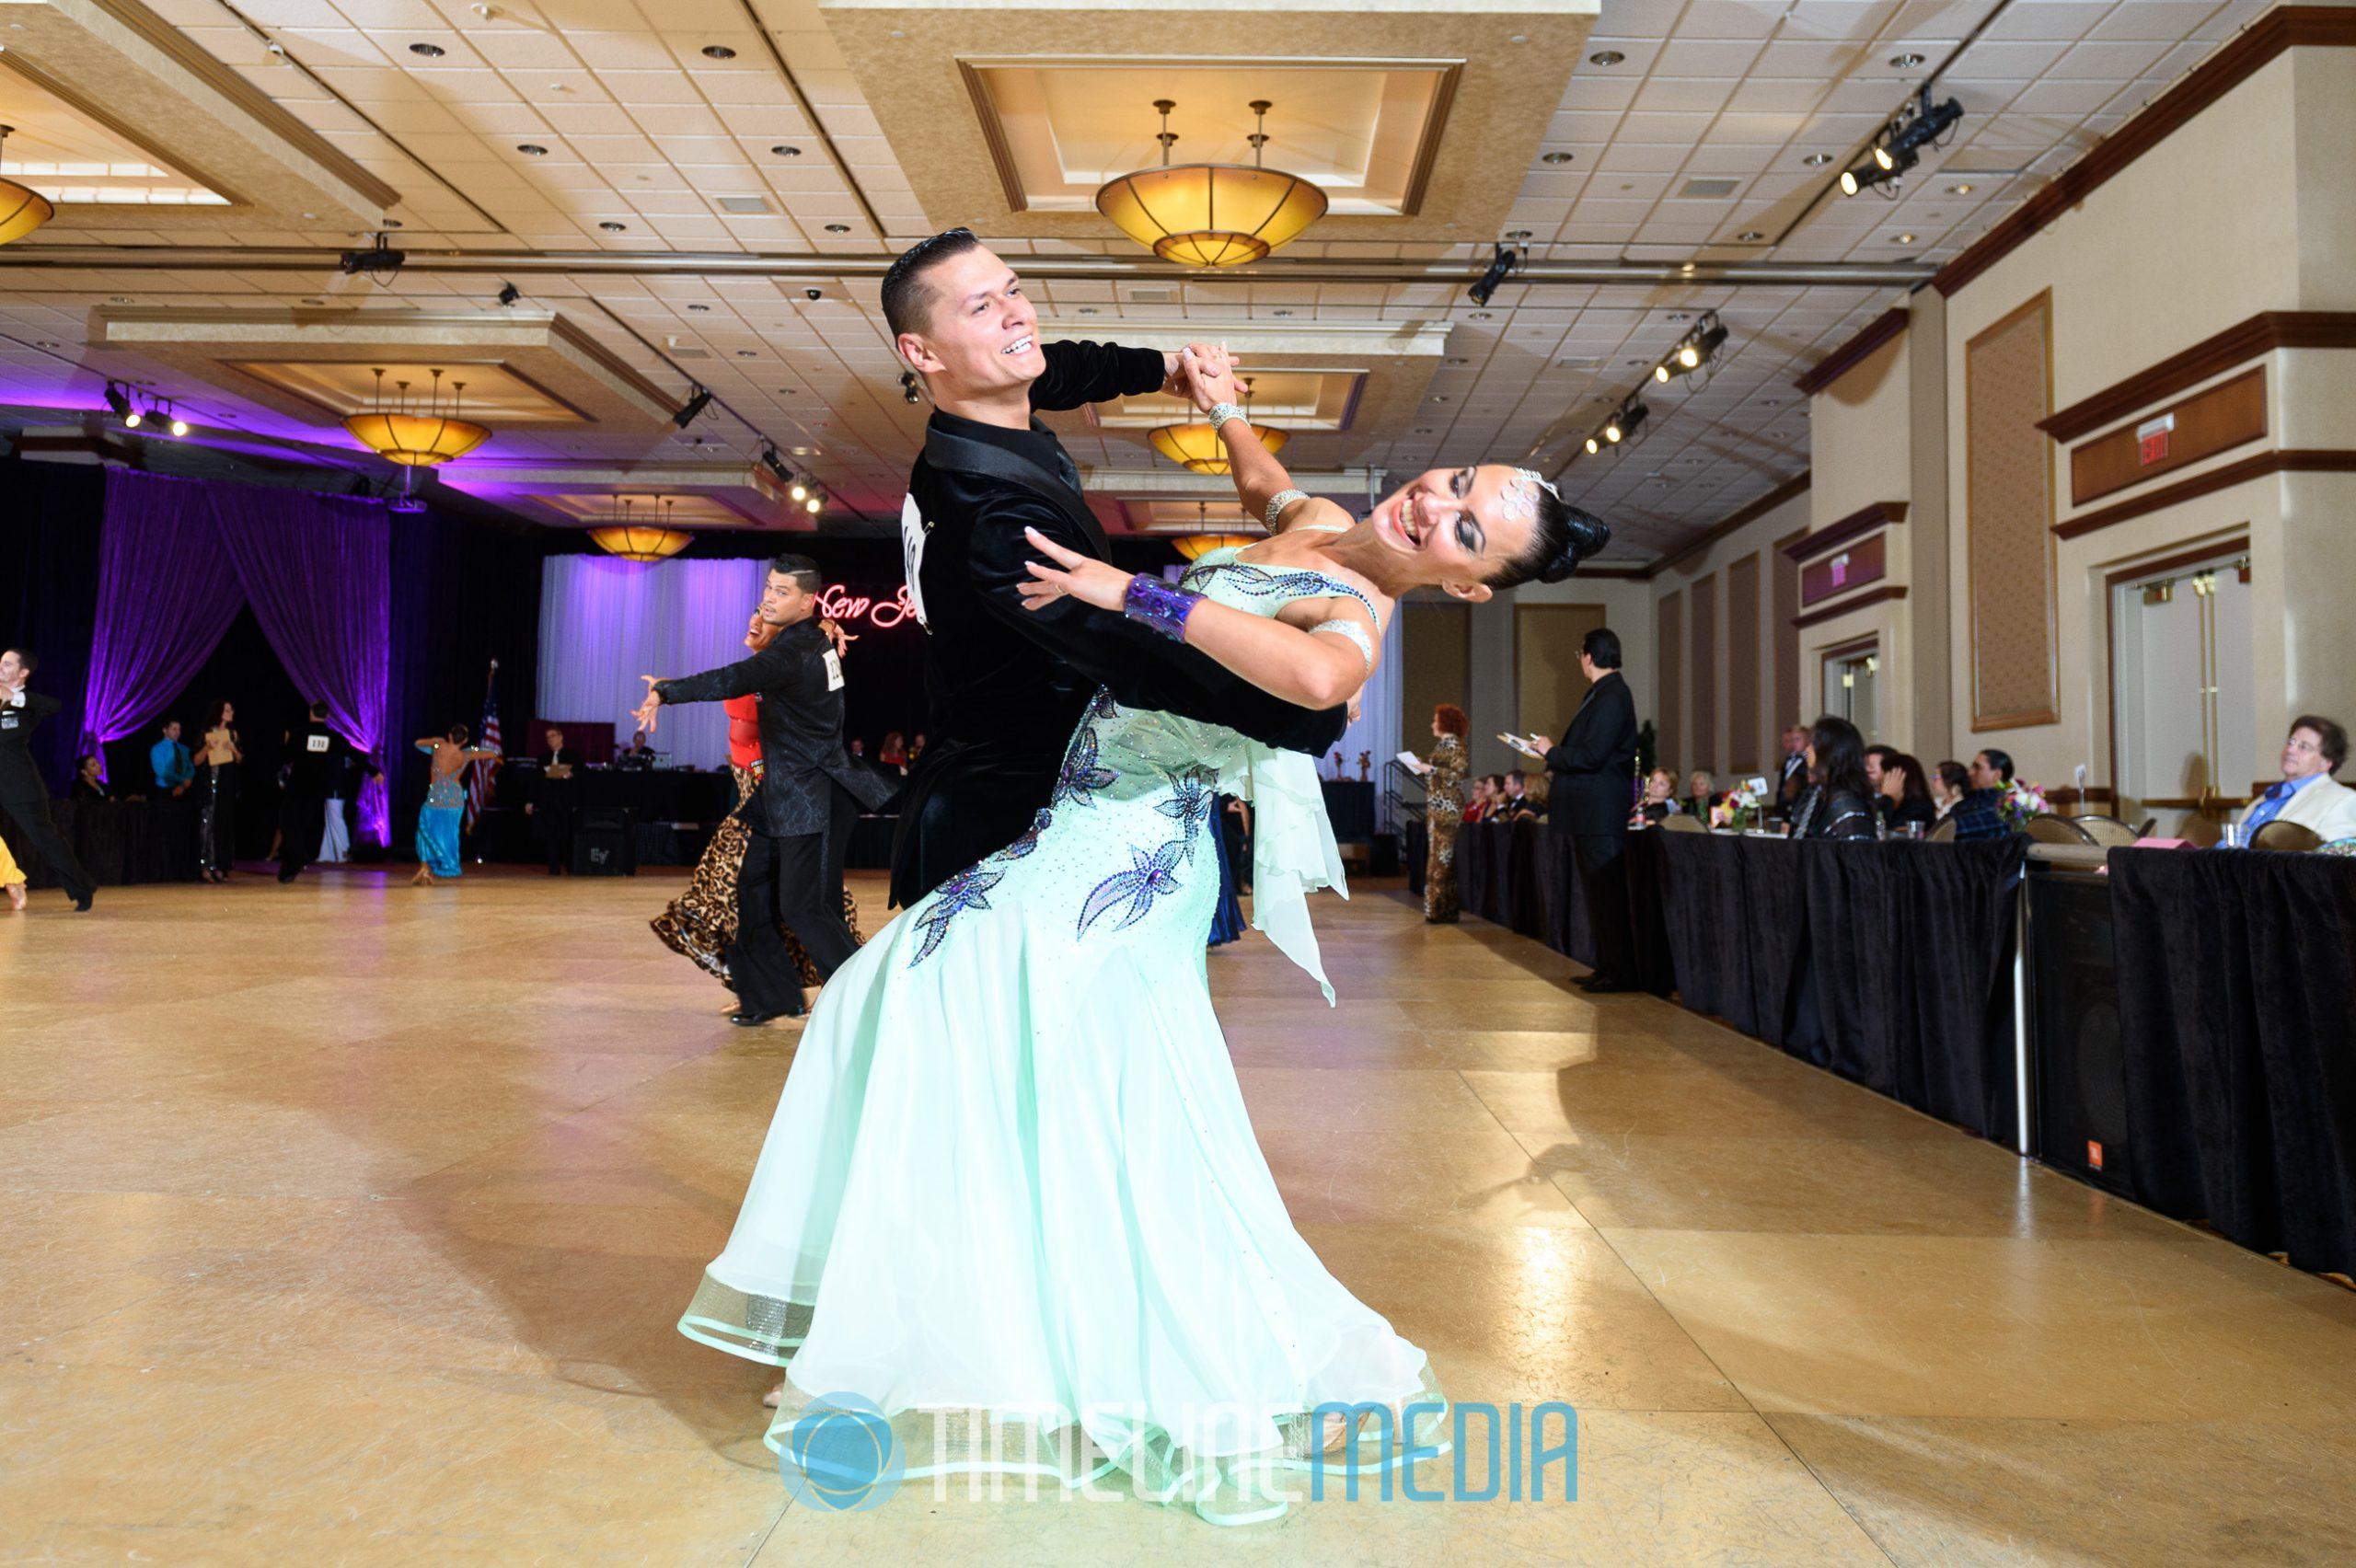 Dancing competition Bally's Atlantic City, NJ ©TimeLine Media